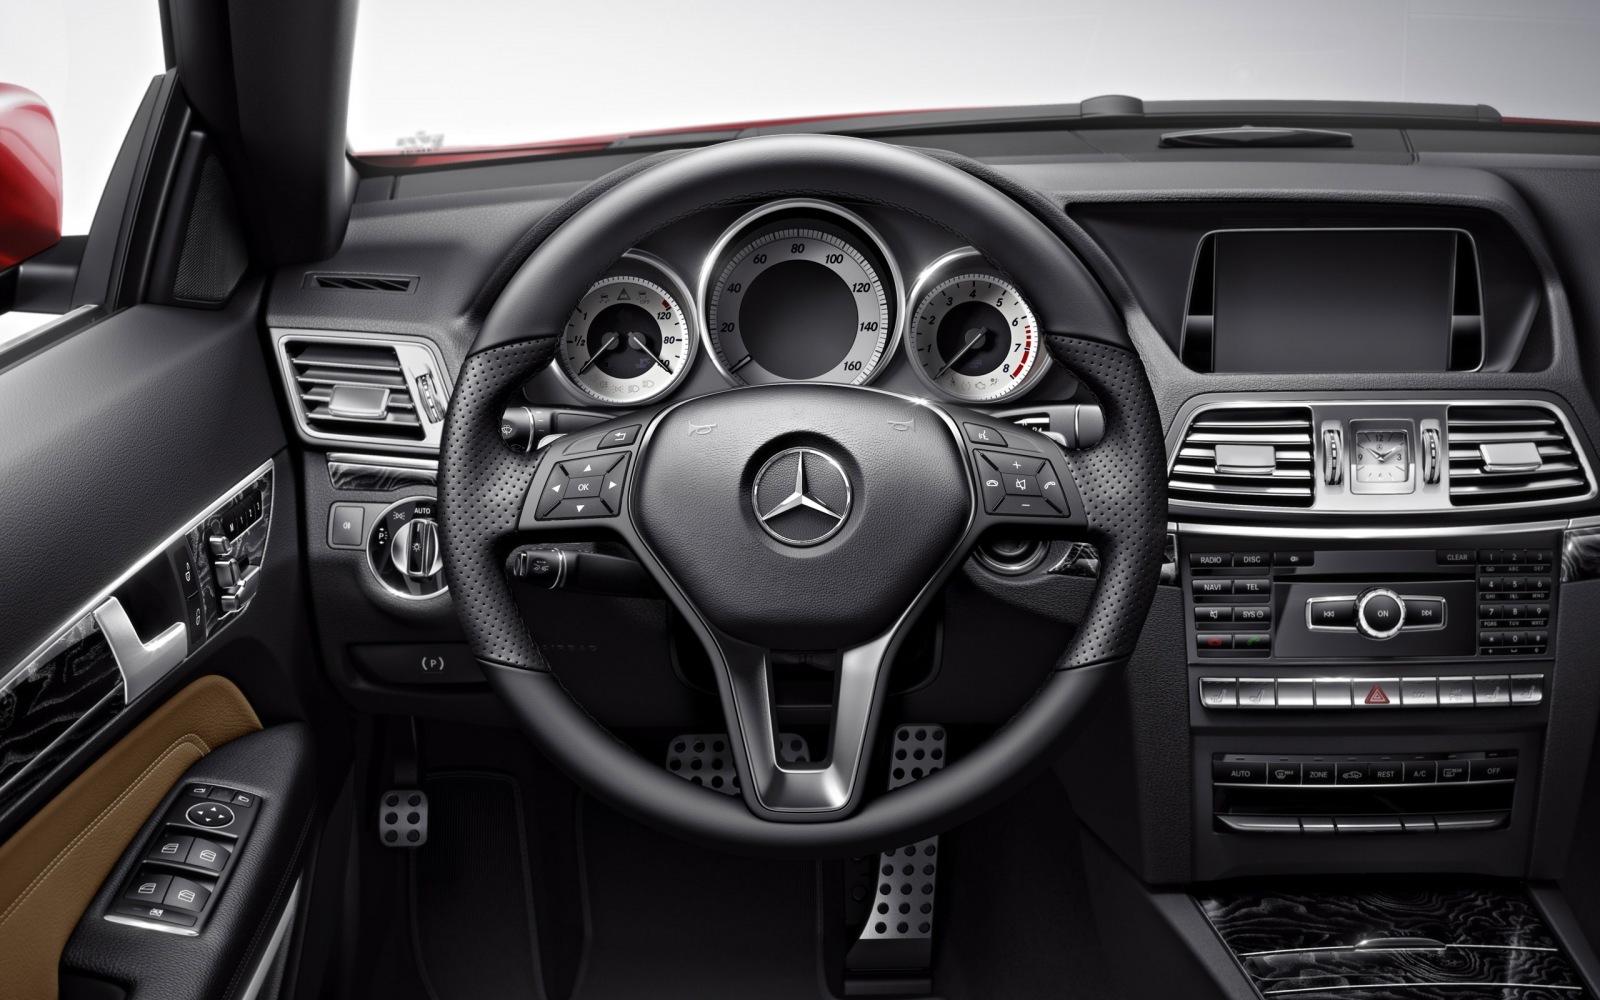 Interi ry mercedes benz t dy e nejvy ohodnocen luxury prague life - Mercedes e coupe interior ...